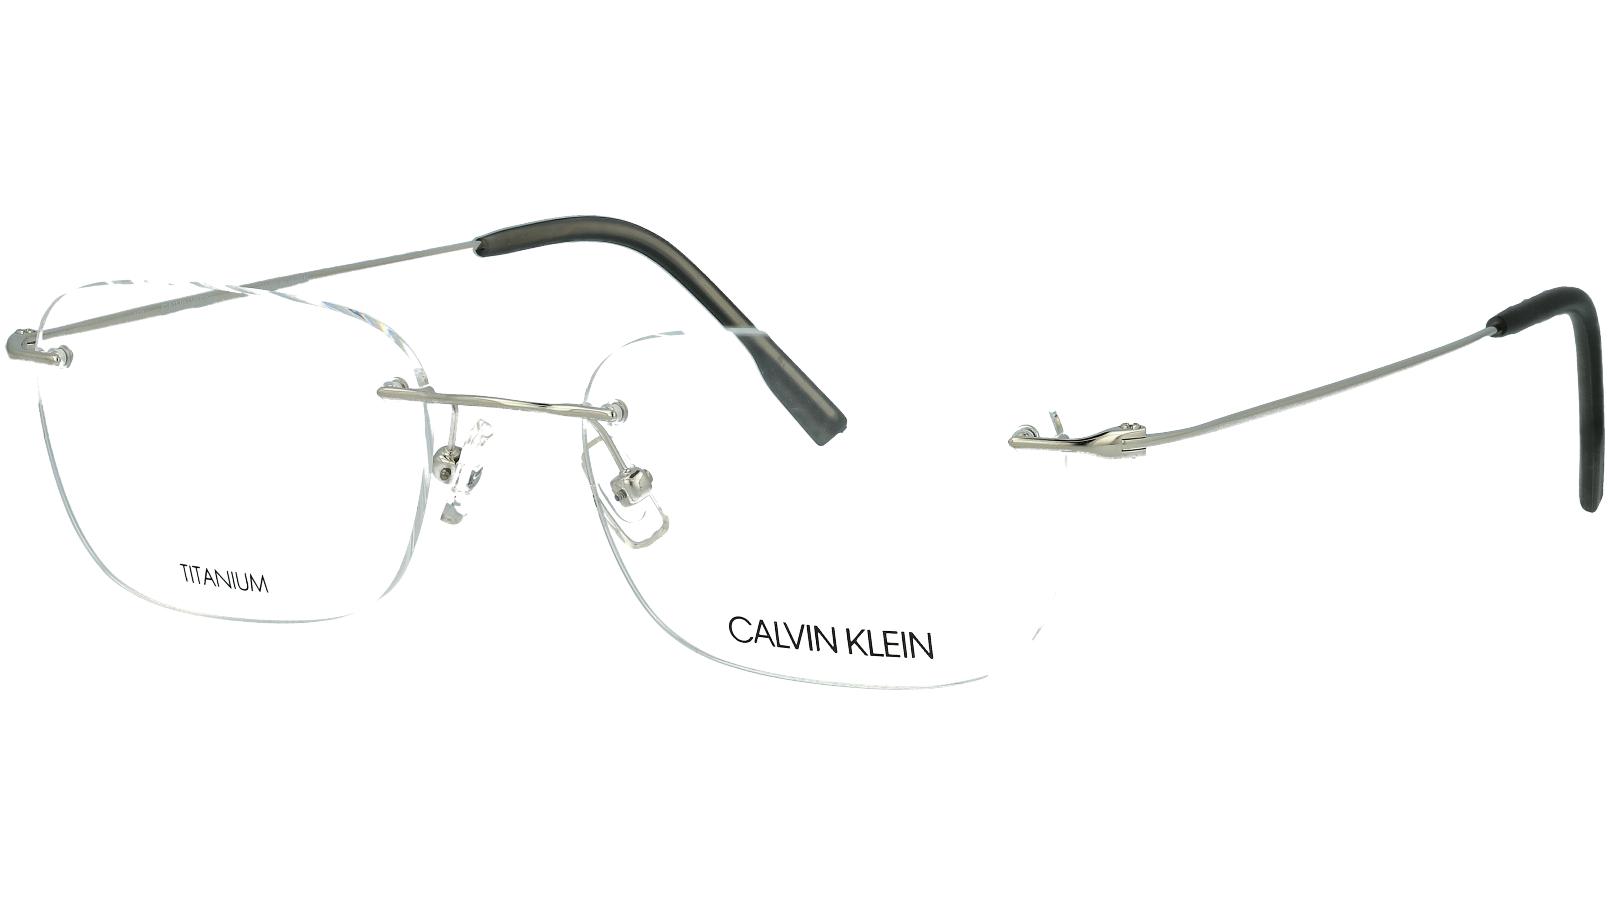 CALVIN KLEIN CK536 030 52 SILVER Glasses